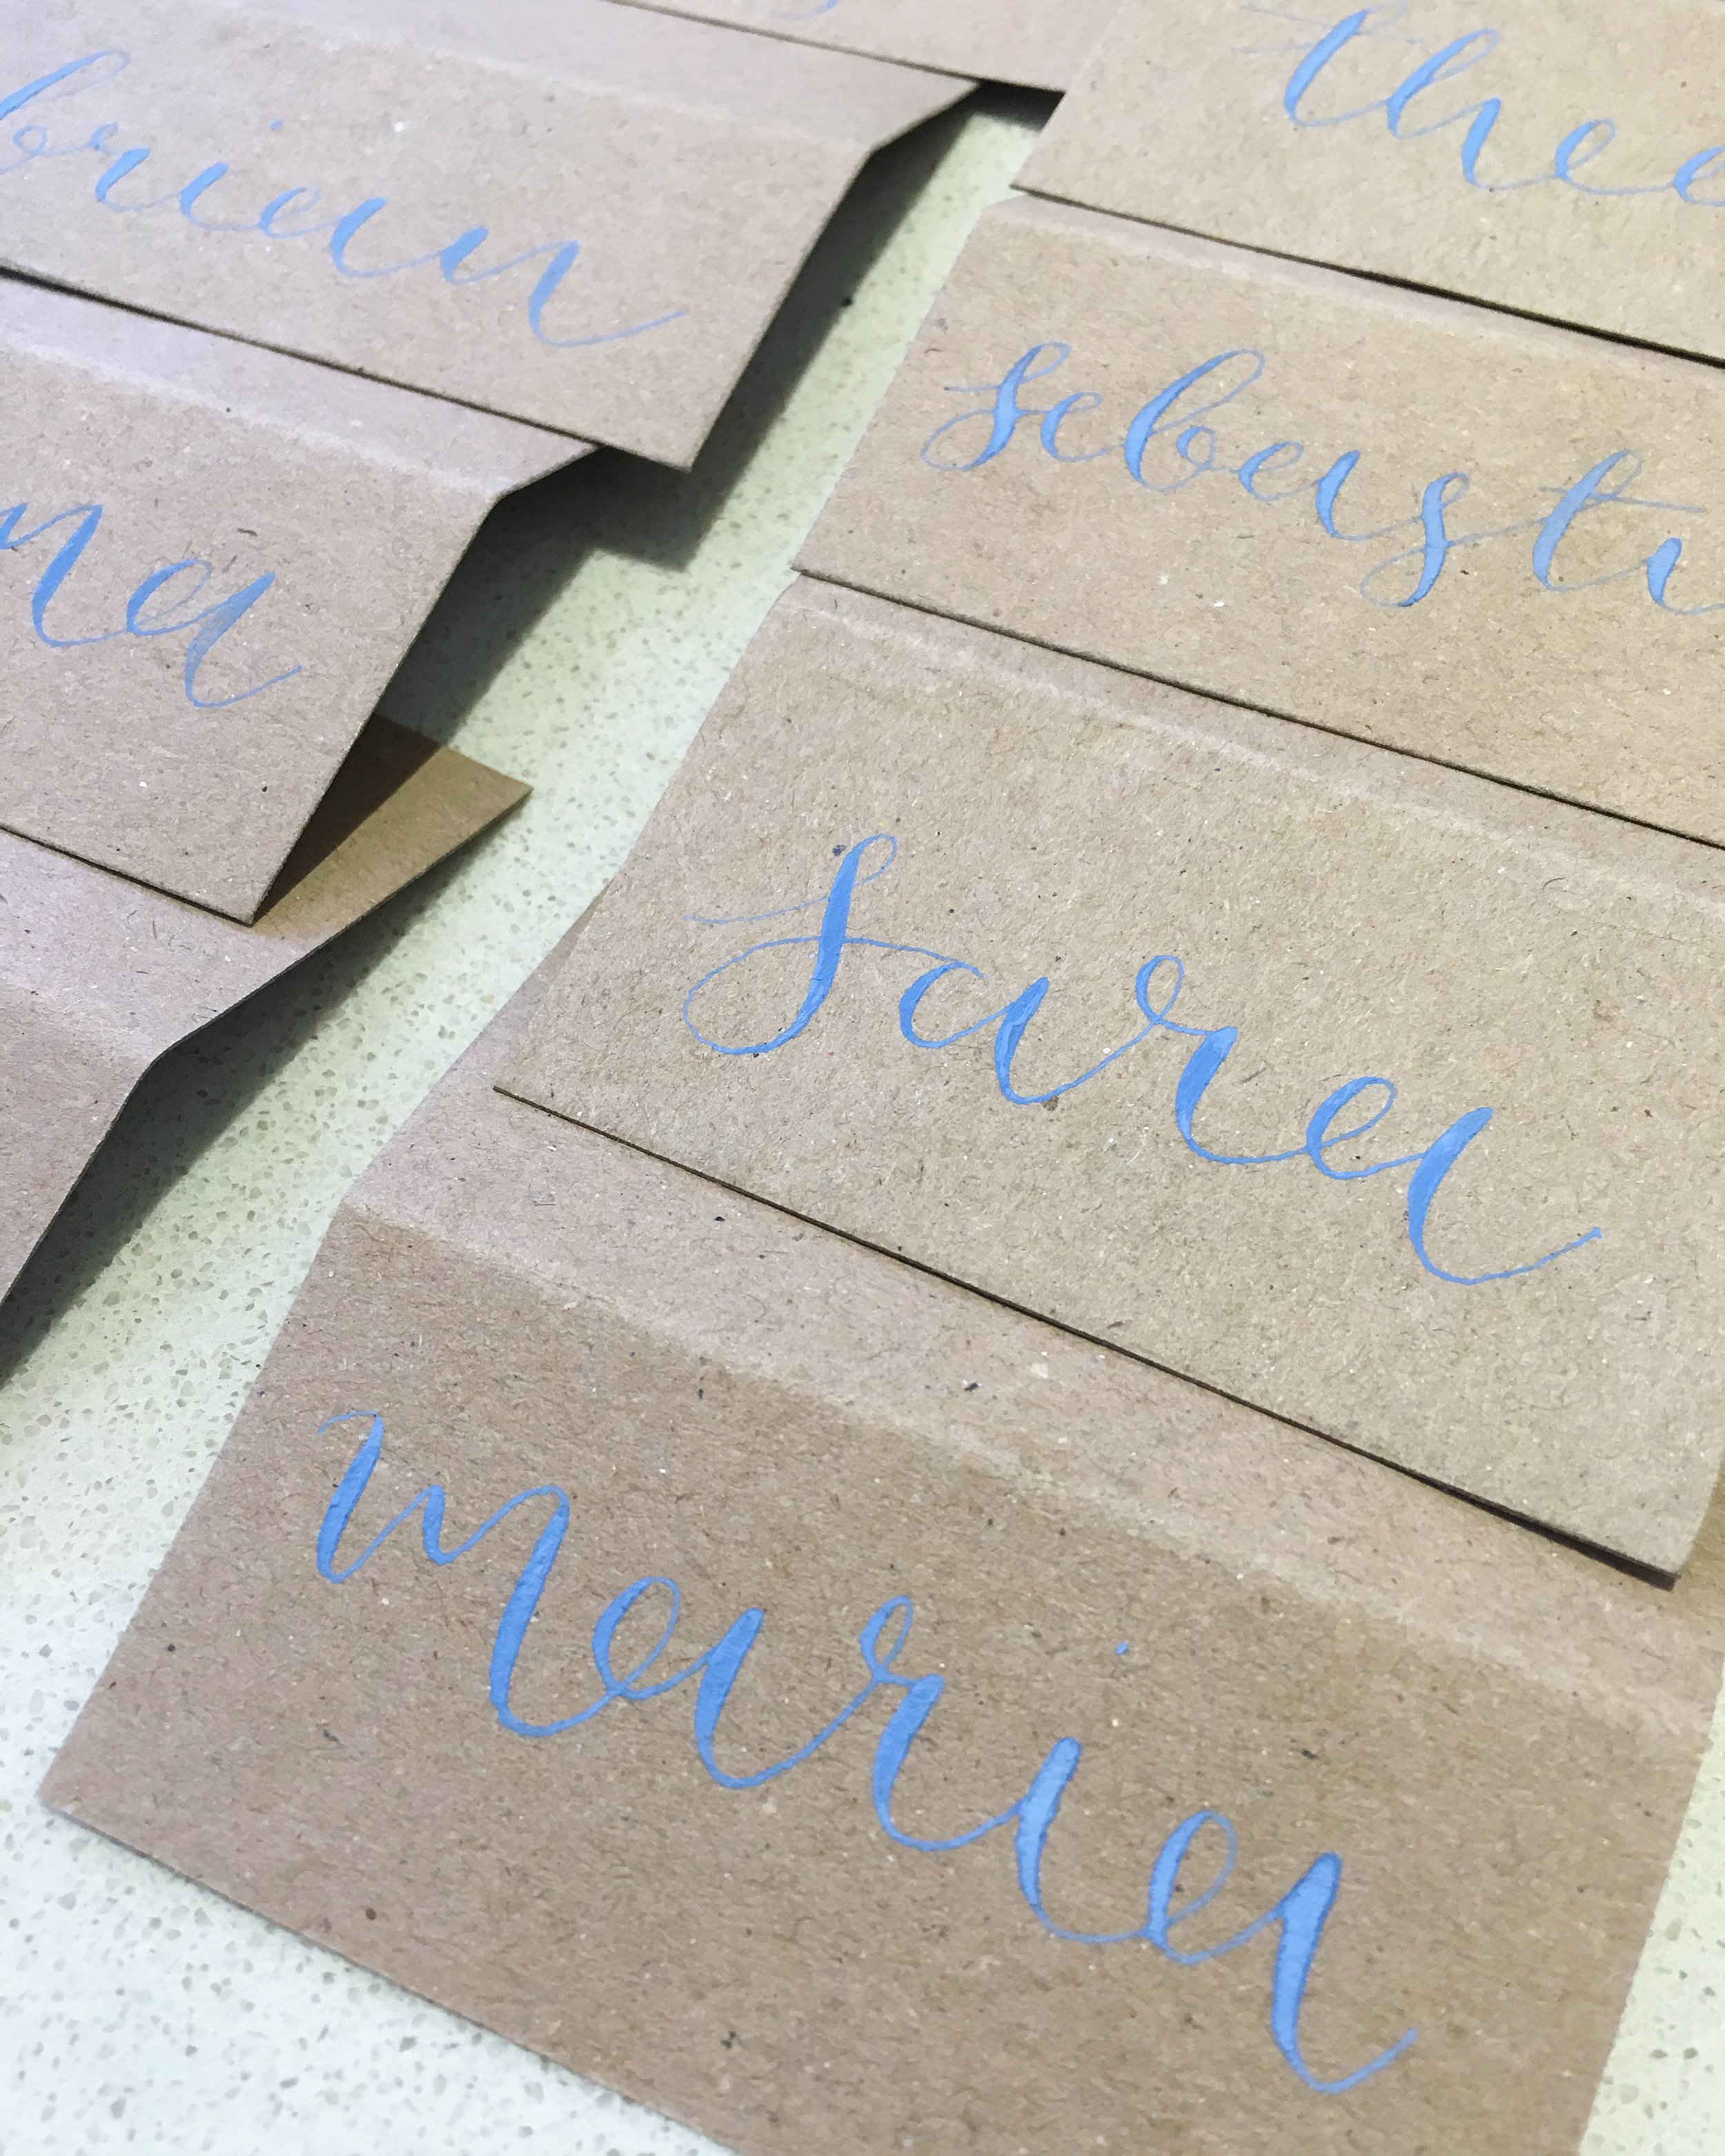 Calligraphy name cards.jpeg